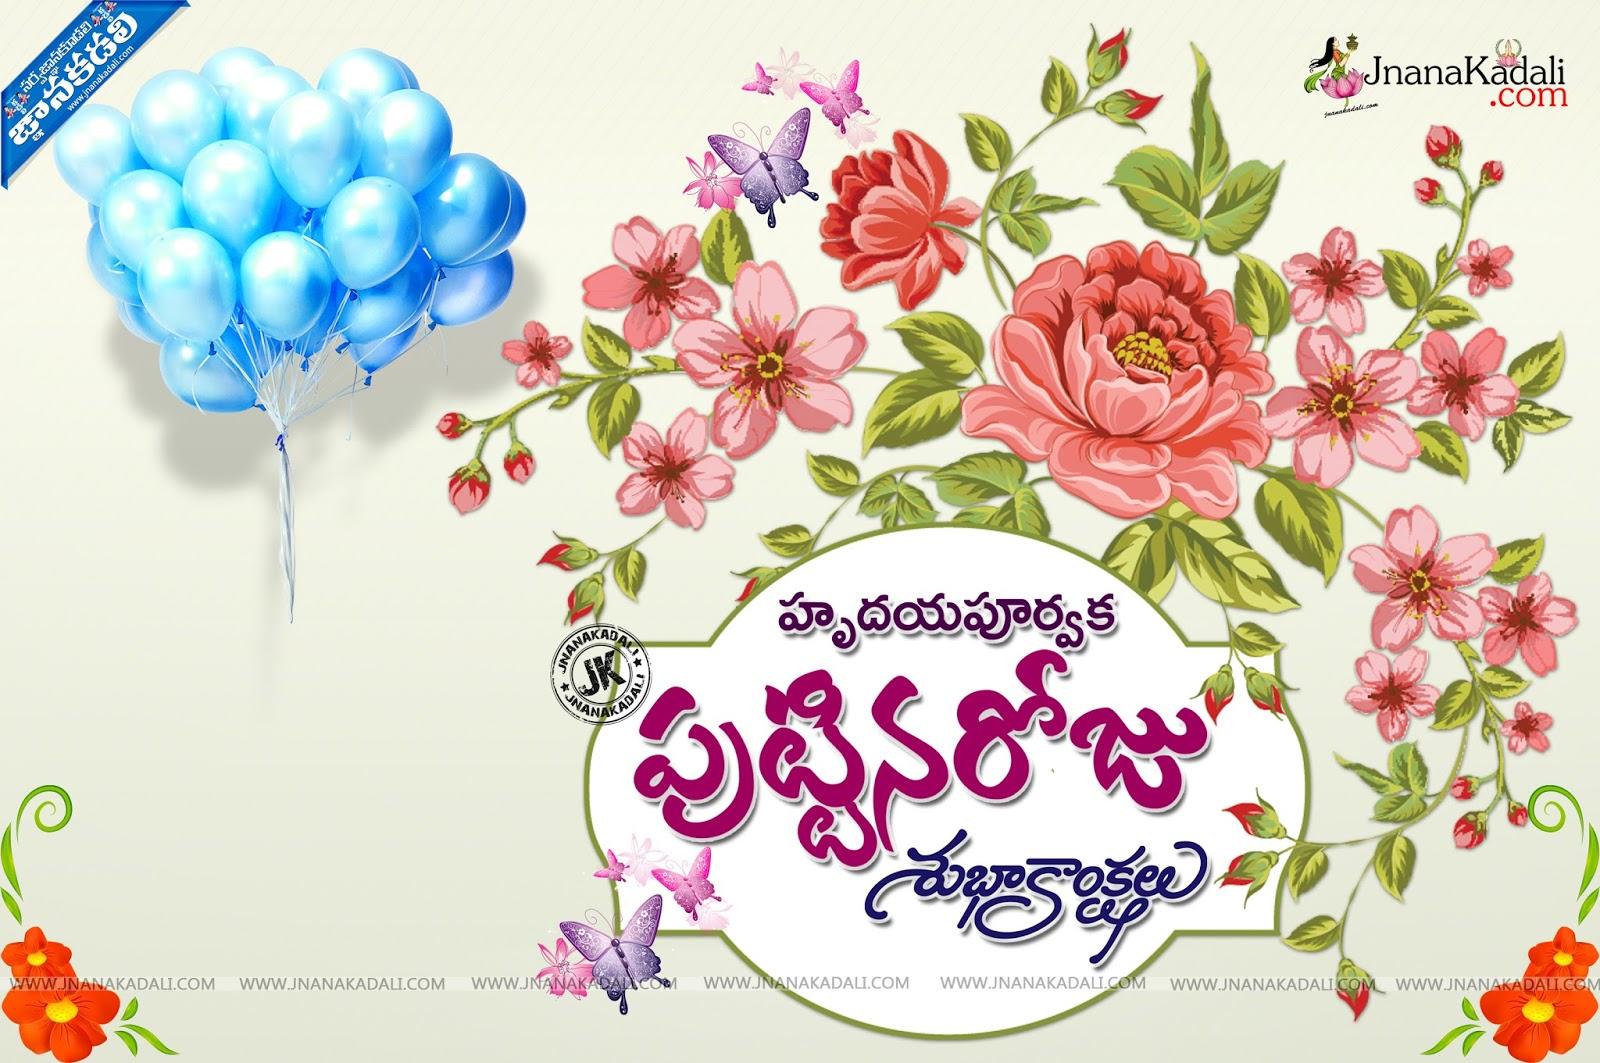 Birthday Telugu Quotations and Greetings Wishes Images – Telugu Birthday Greetings